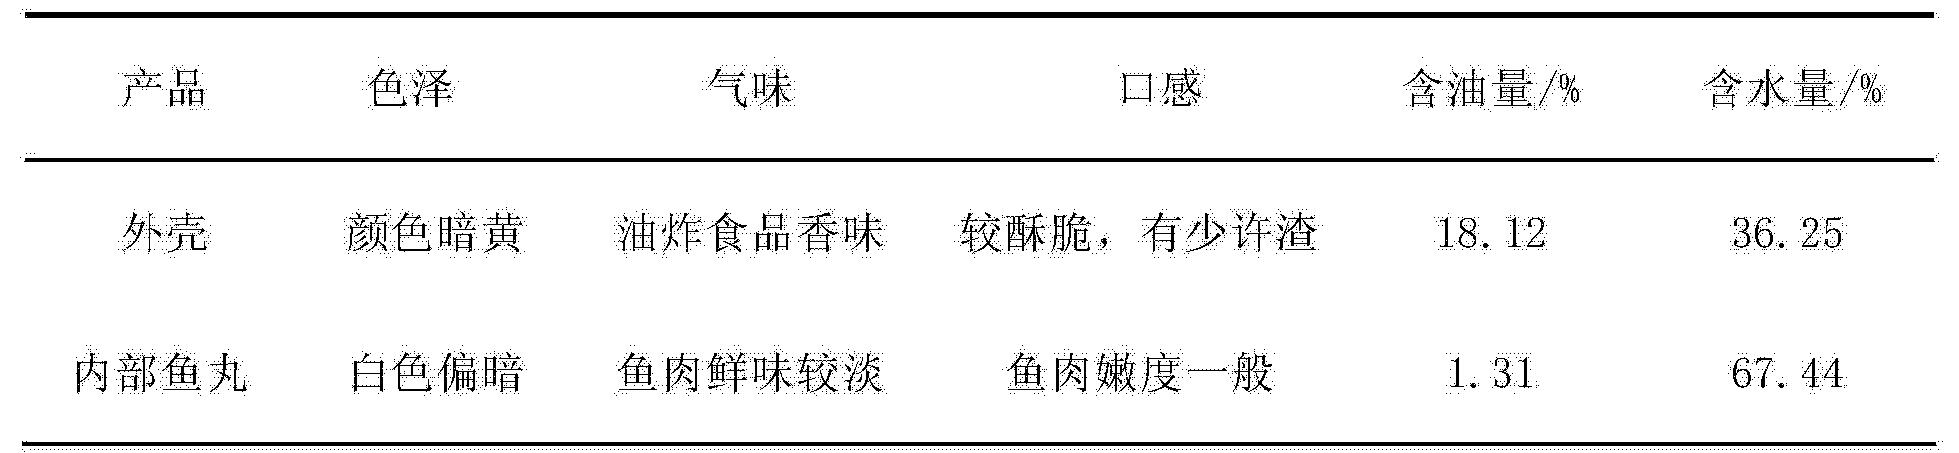 Figure CN104207152AD00072